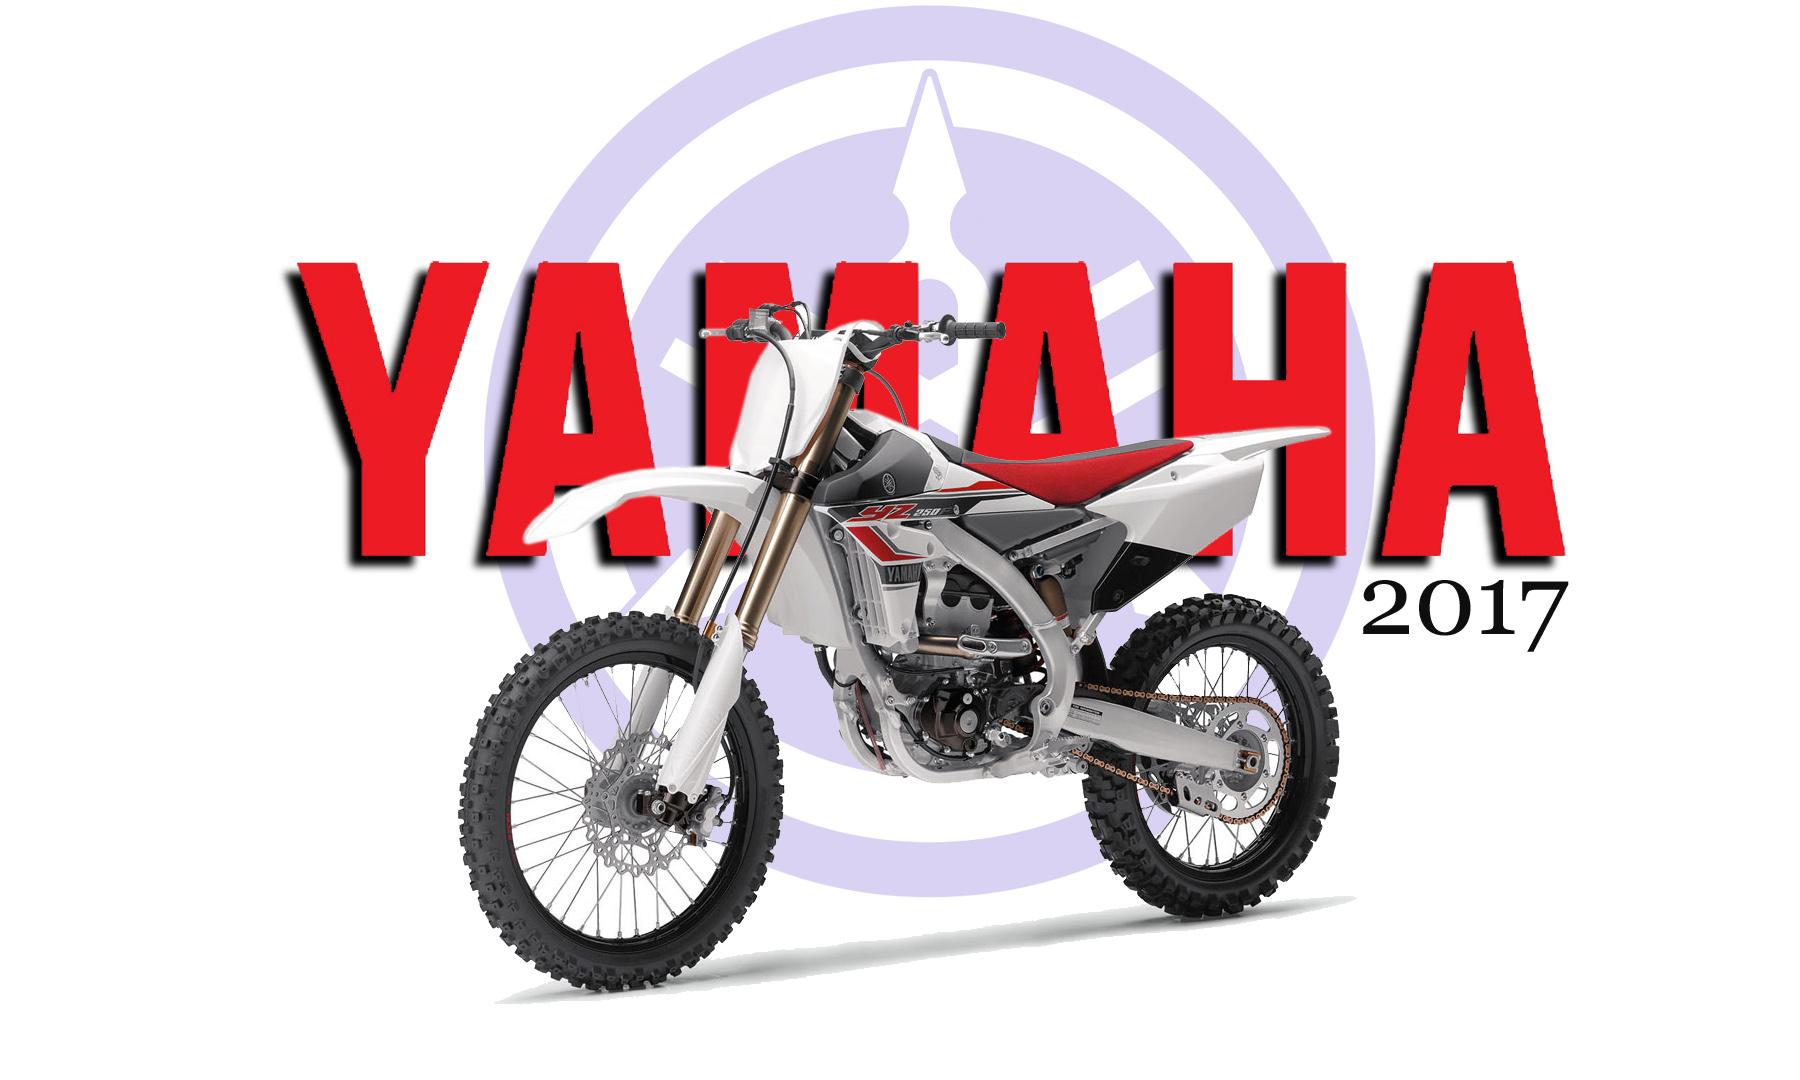 Yamaha 2017 Models